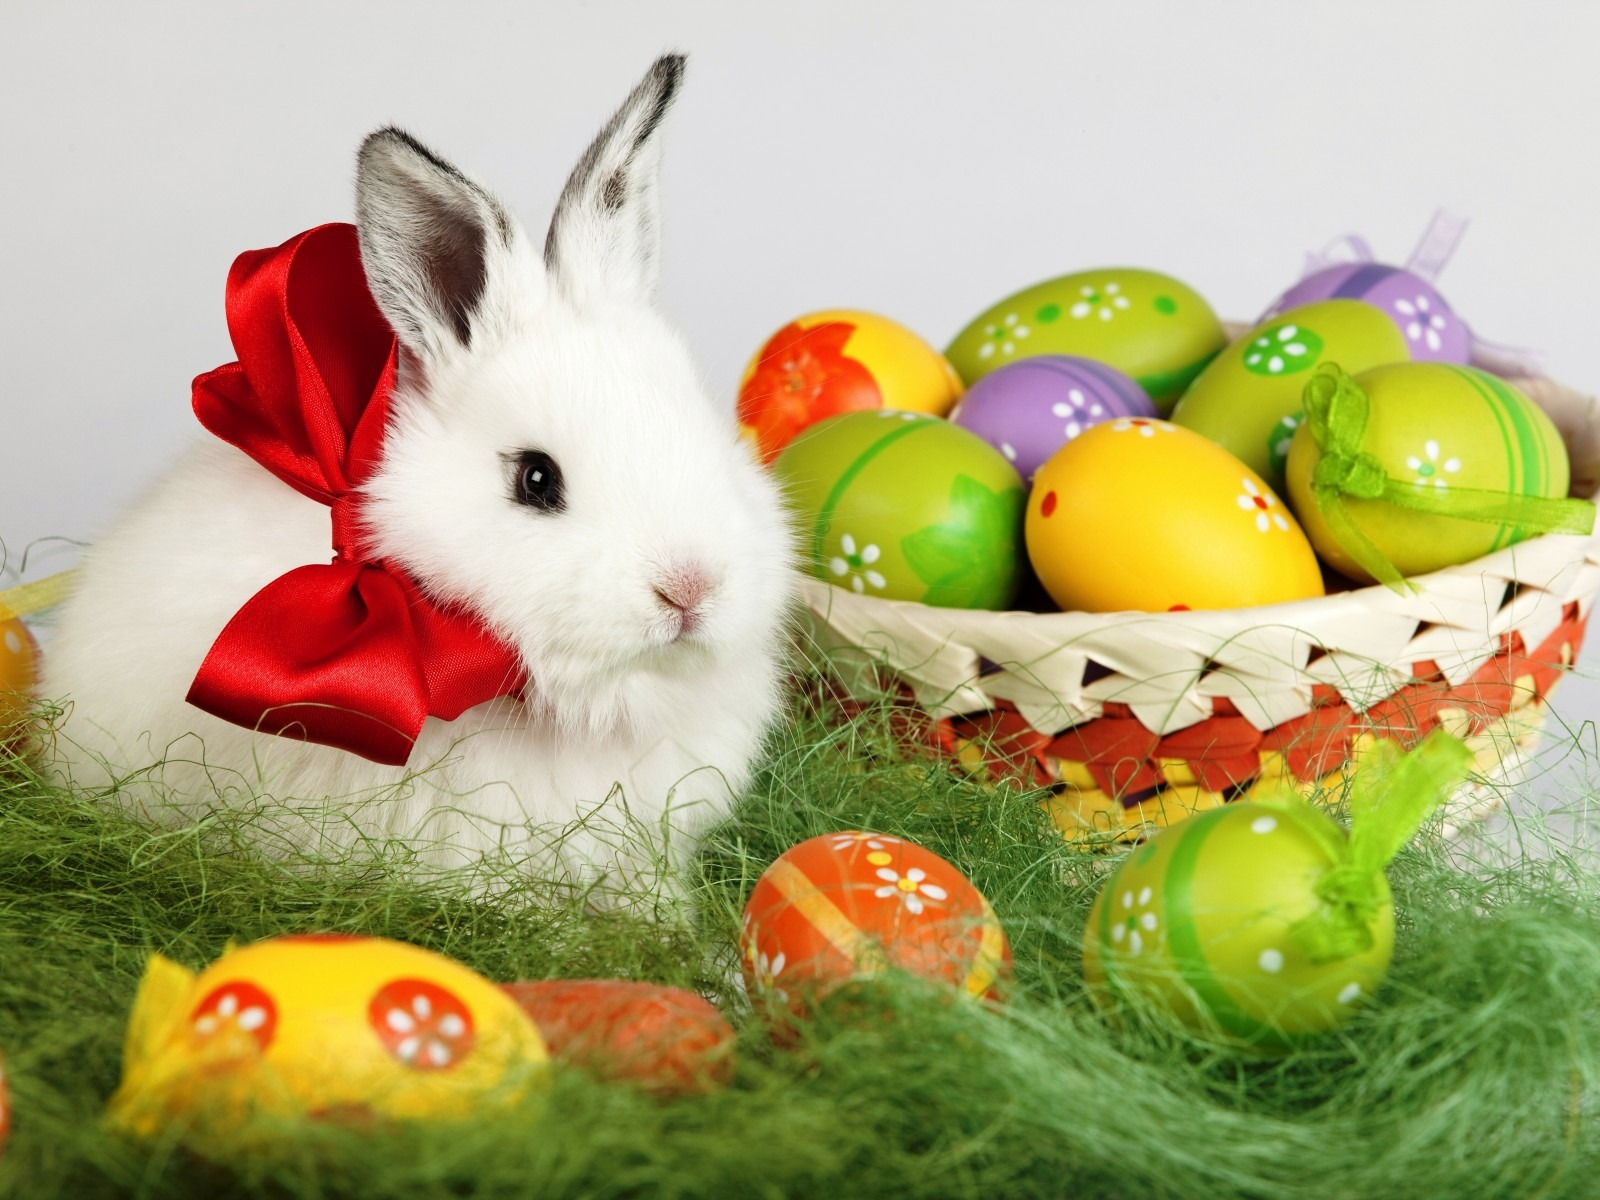 50 Easter Bunny Wallpaper For Desktop On Wallpapersafari